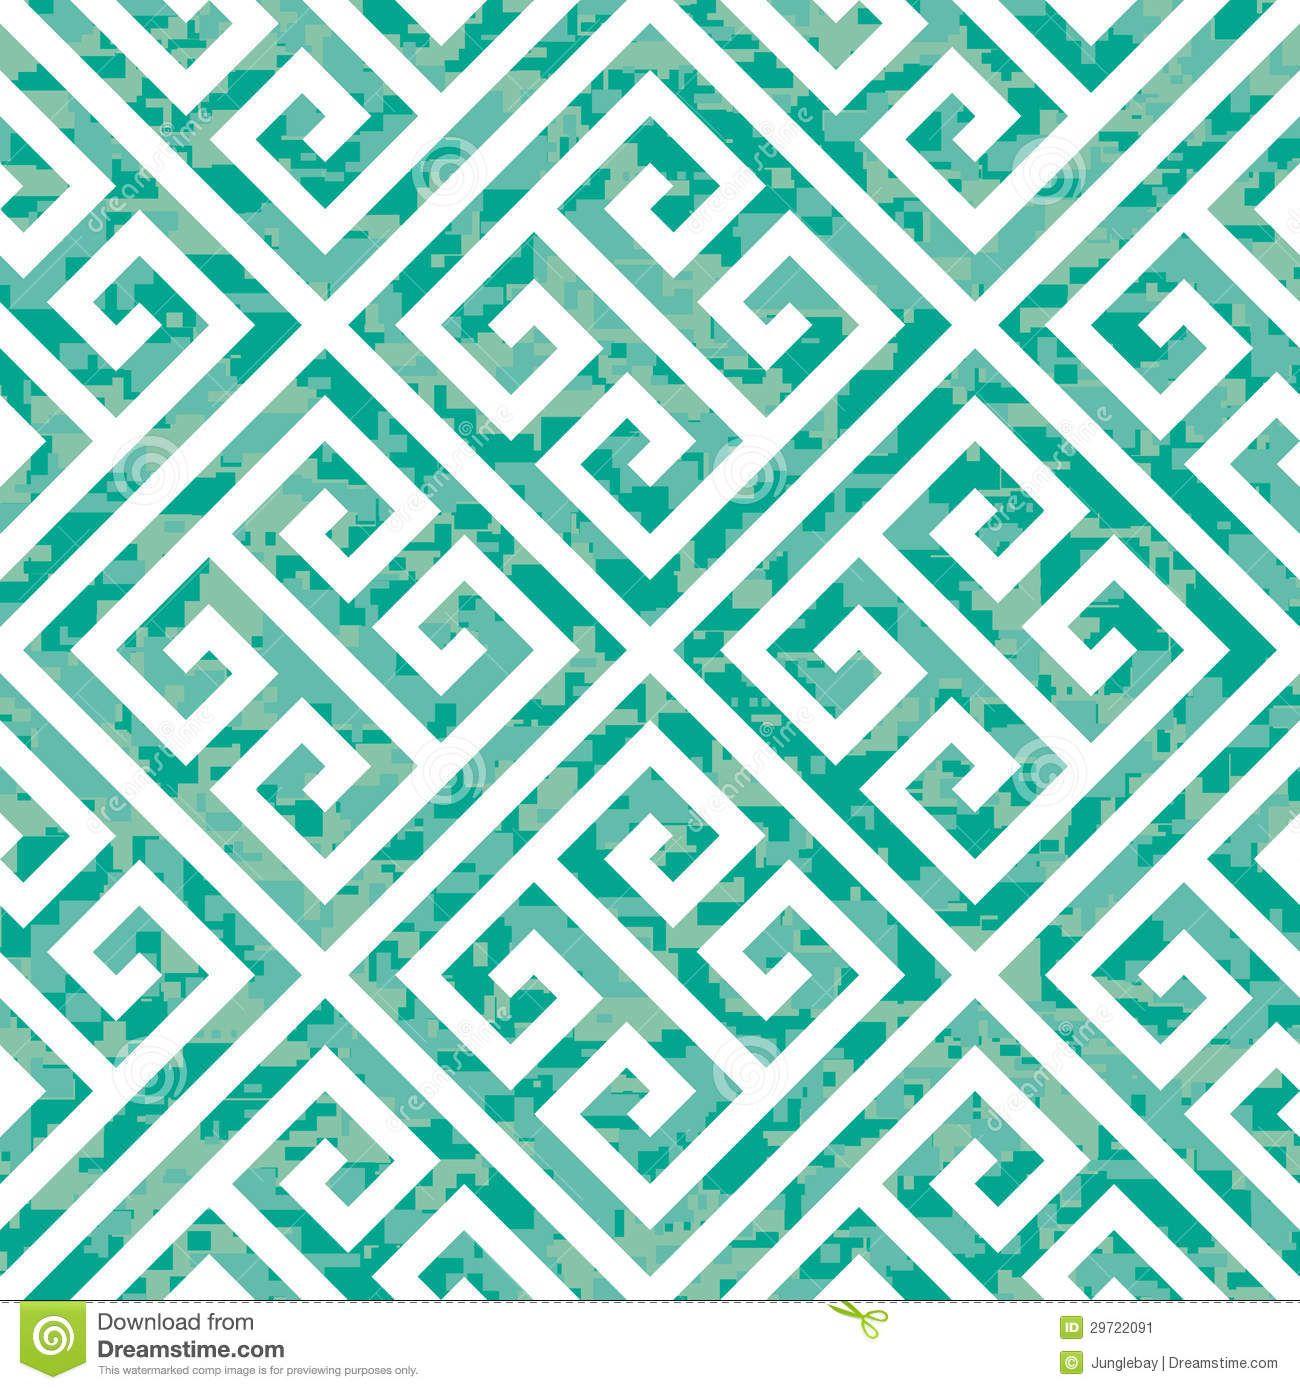 Temporary Fabric Wallpaper Modern Pattern Vectors Image Seamless Greek Key